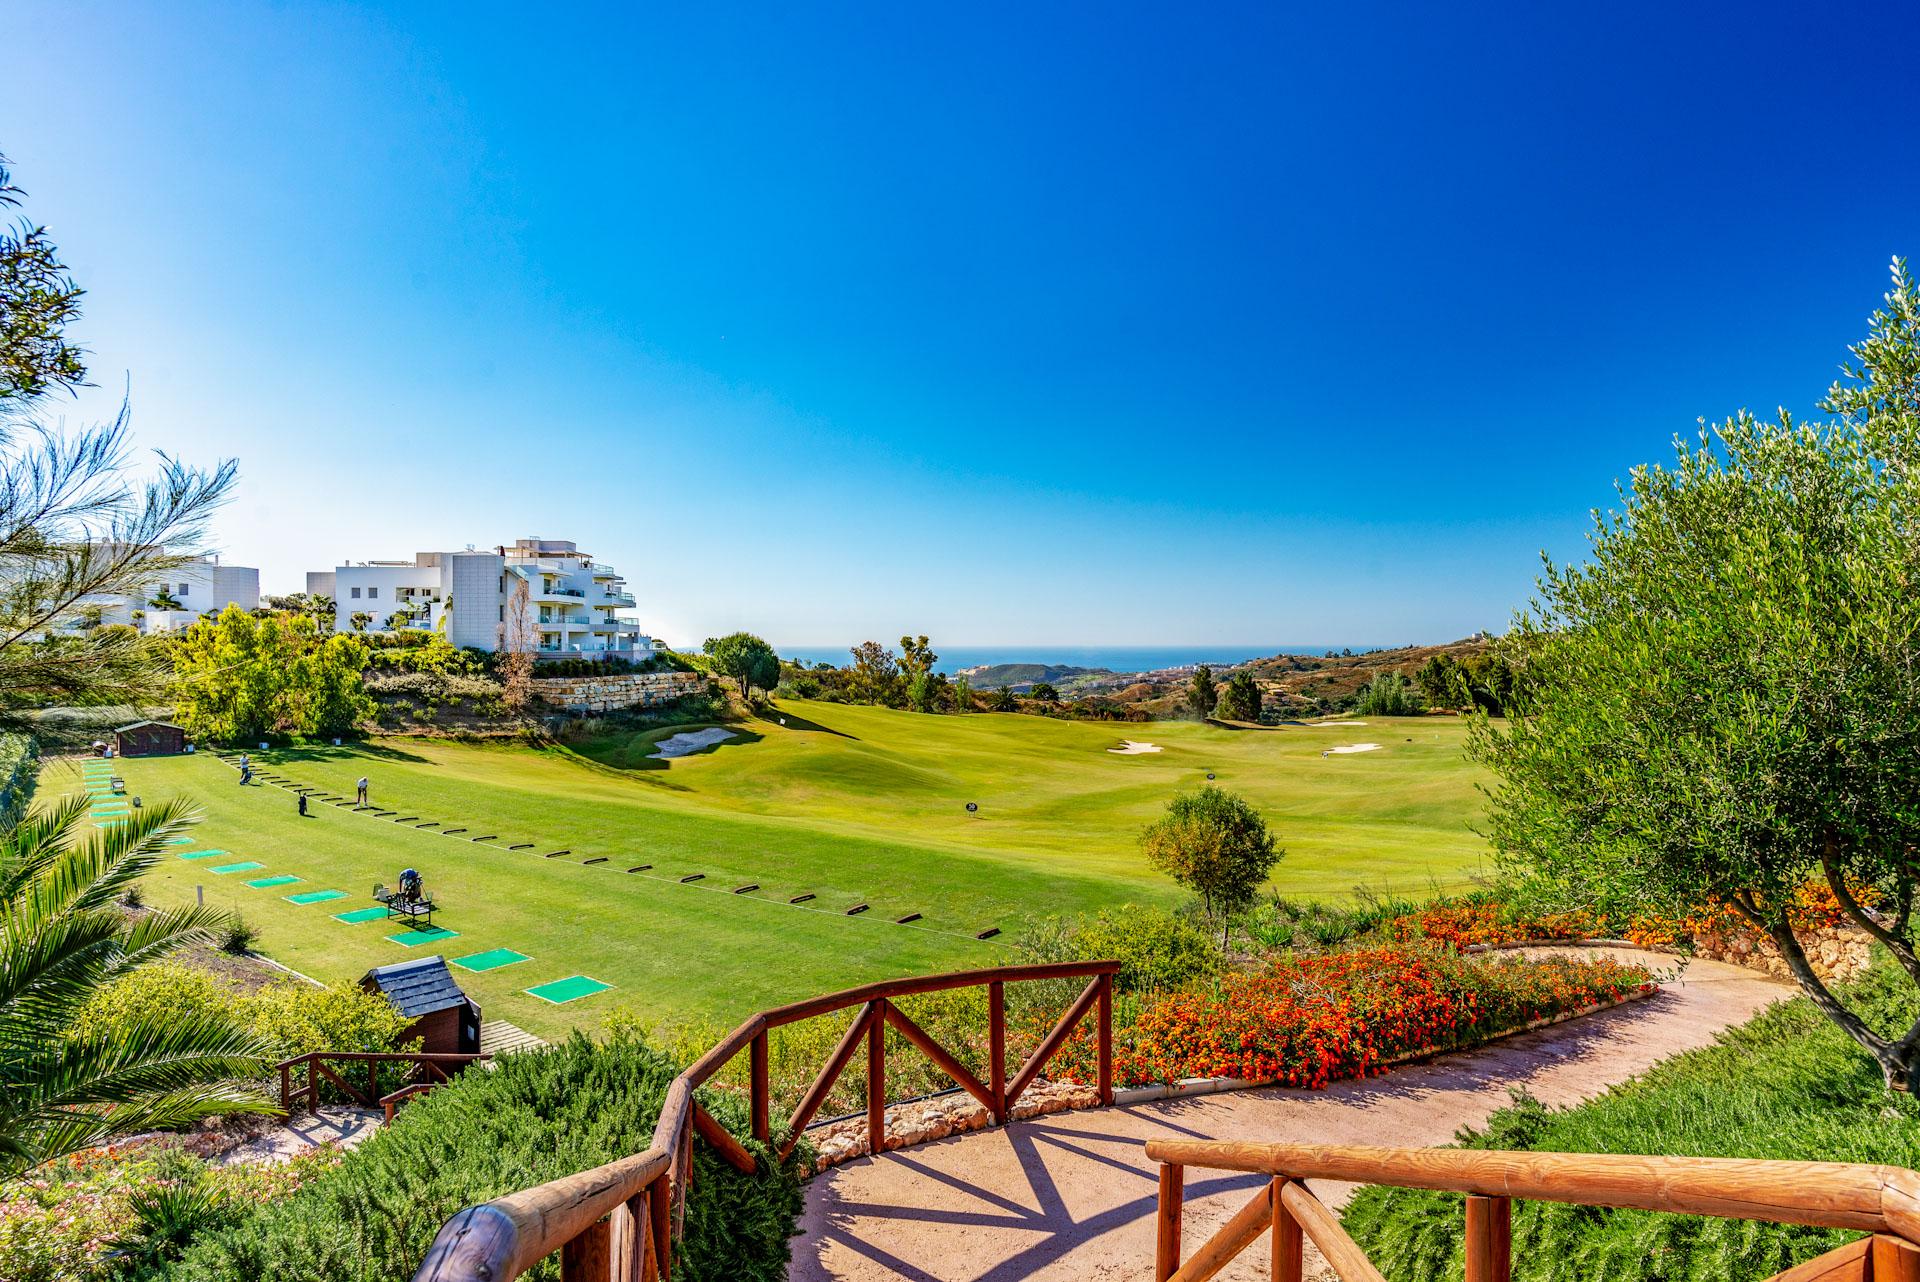 La Cala - Campo Europa Golf Course-17174